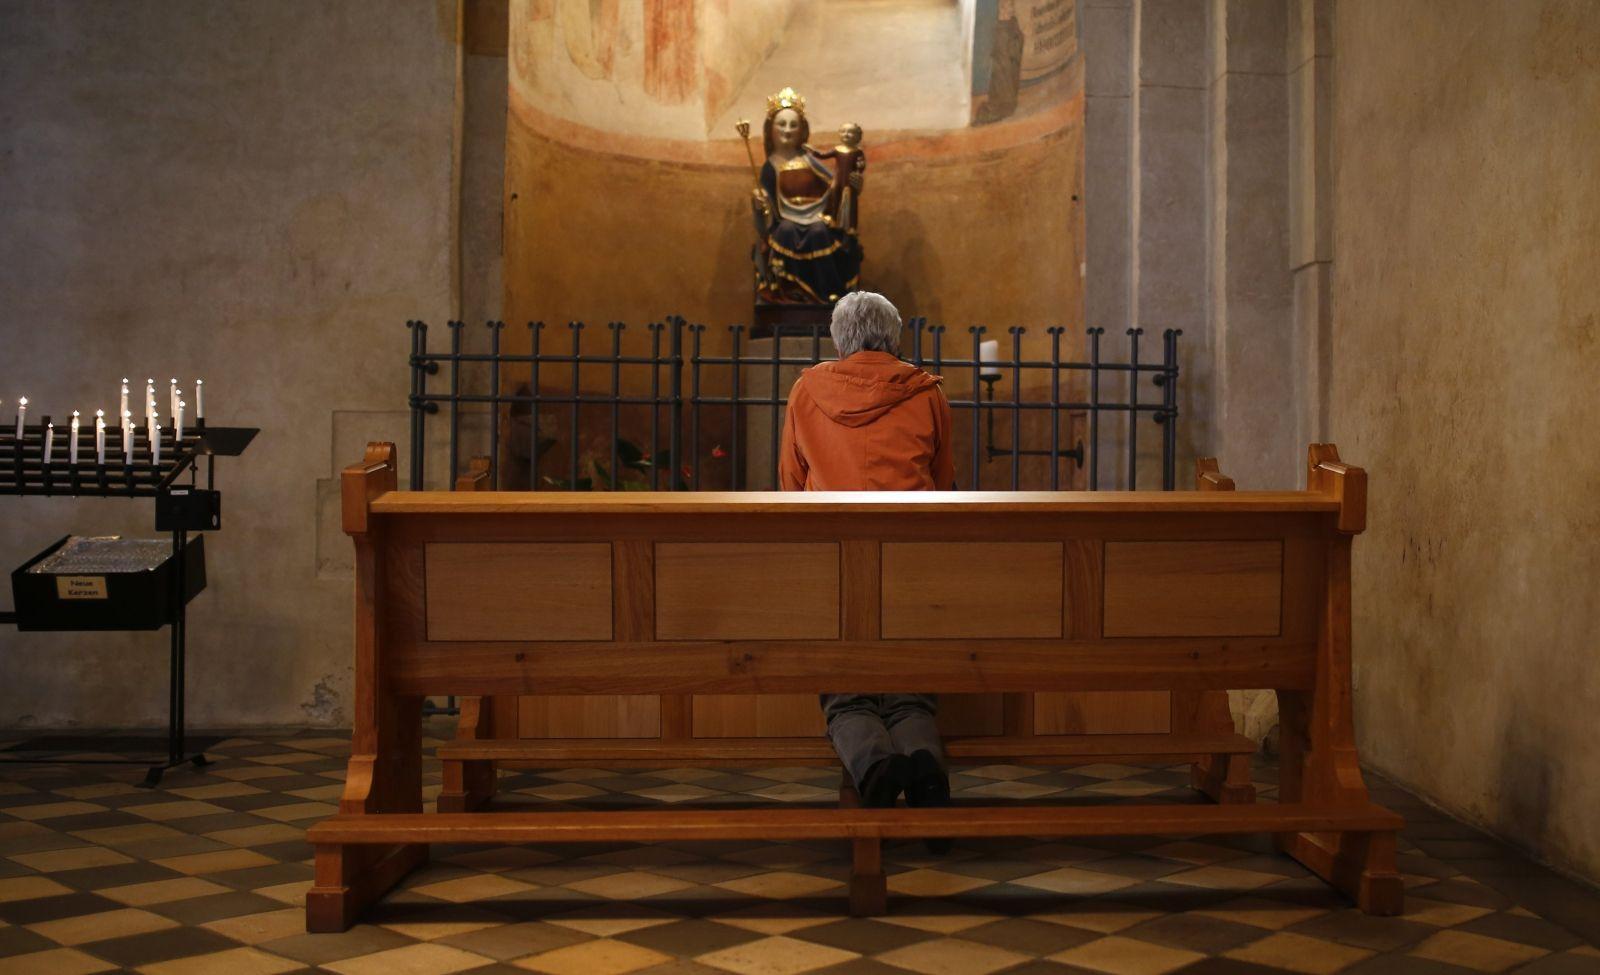 Germany Catholic Church members leave